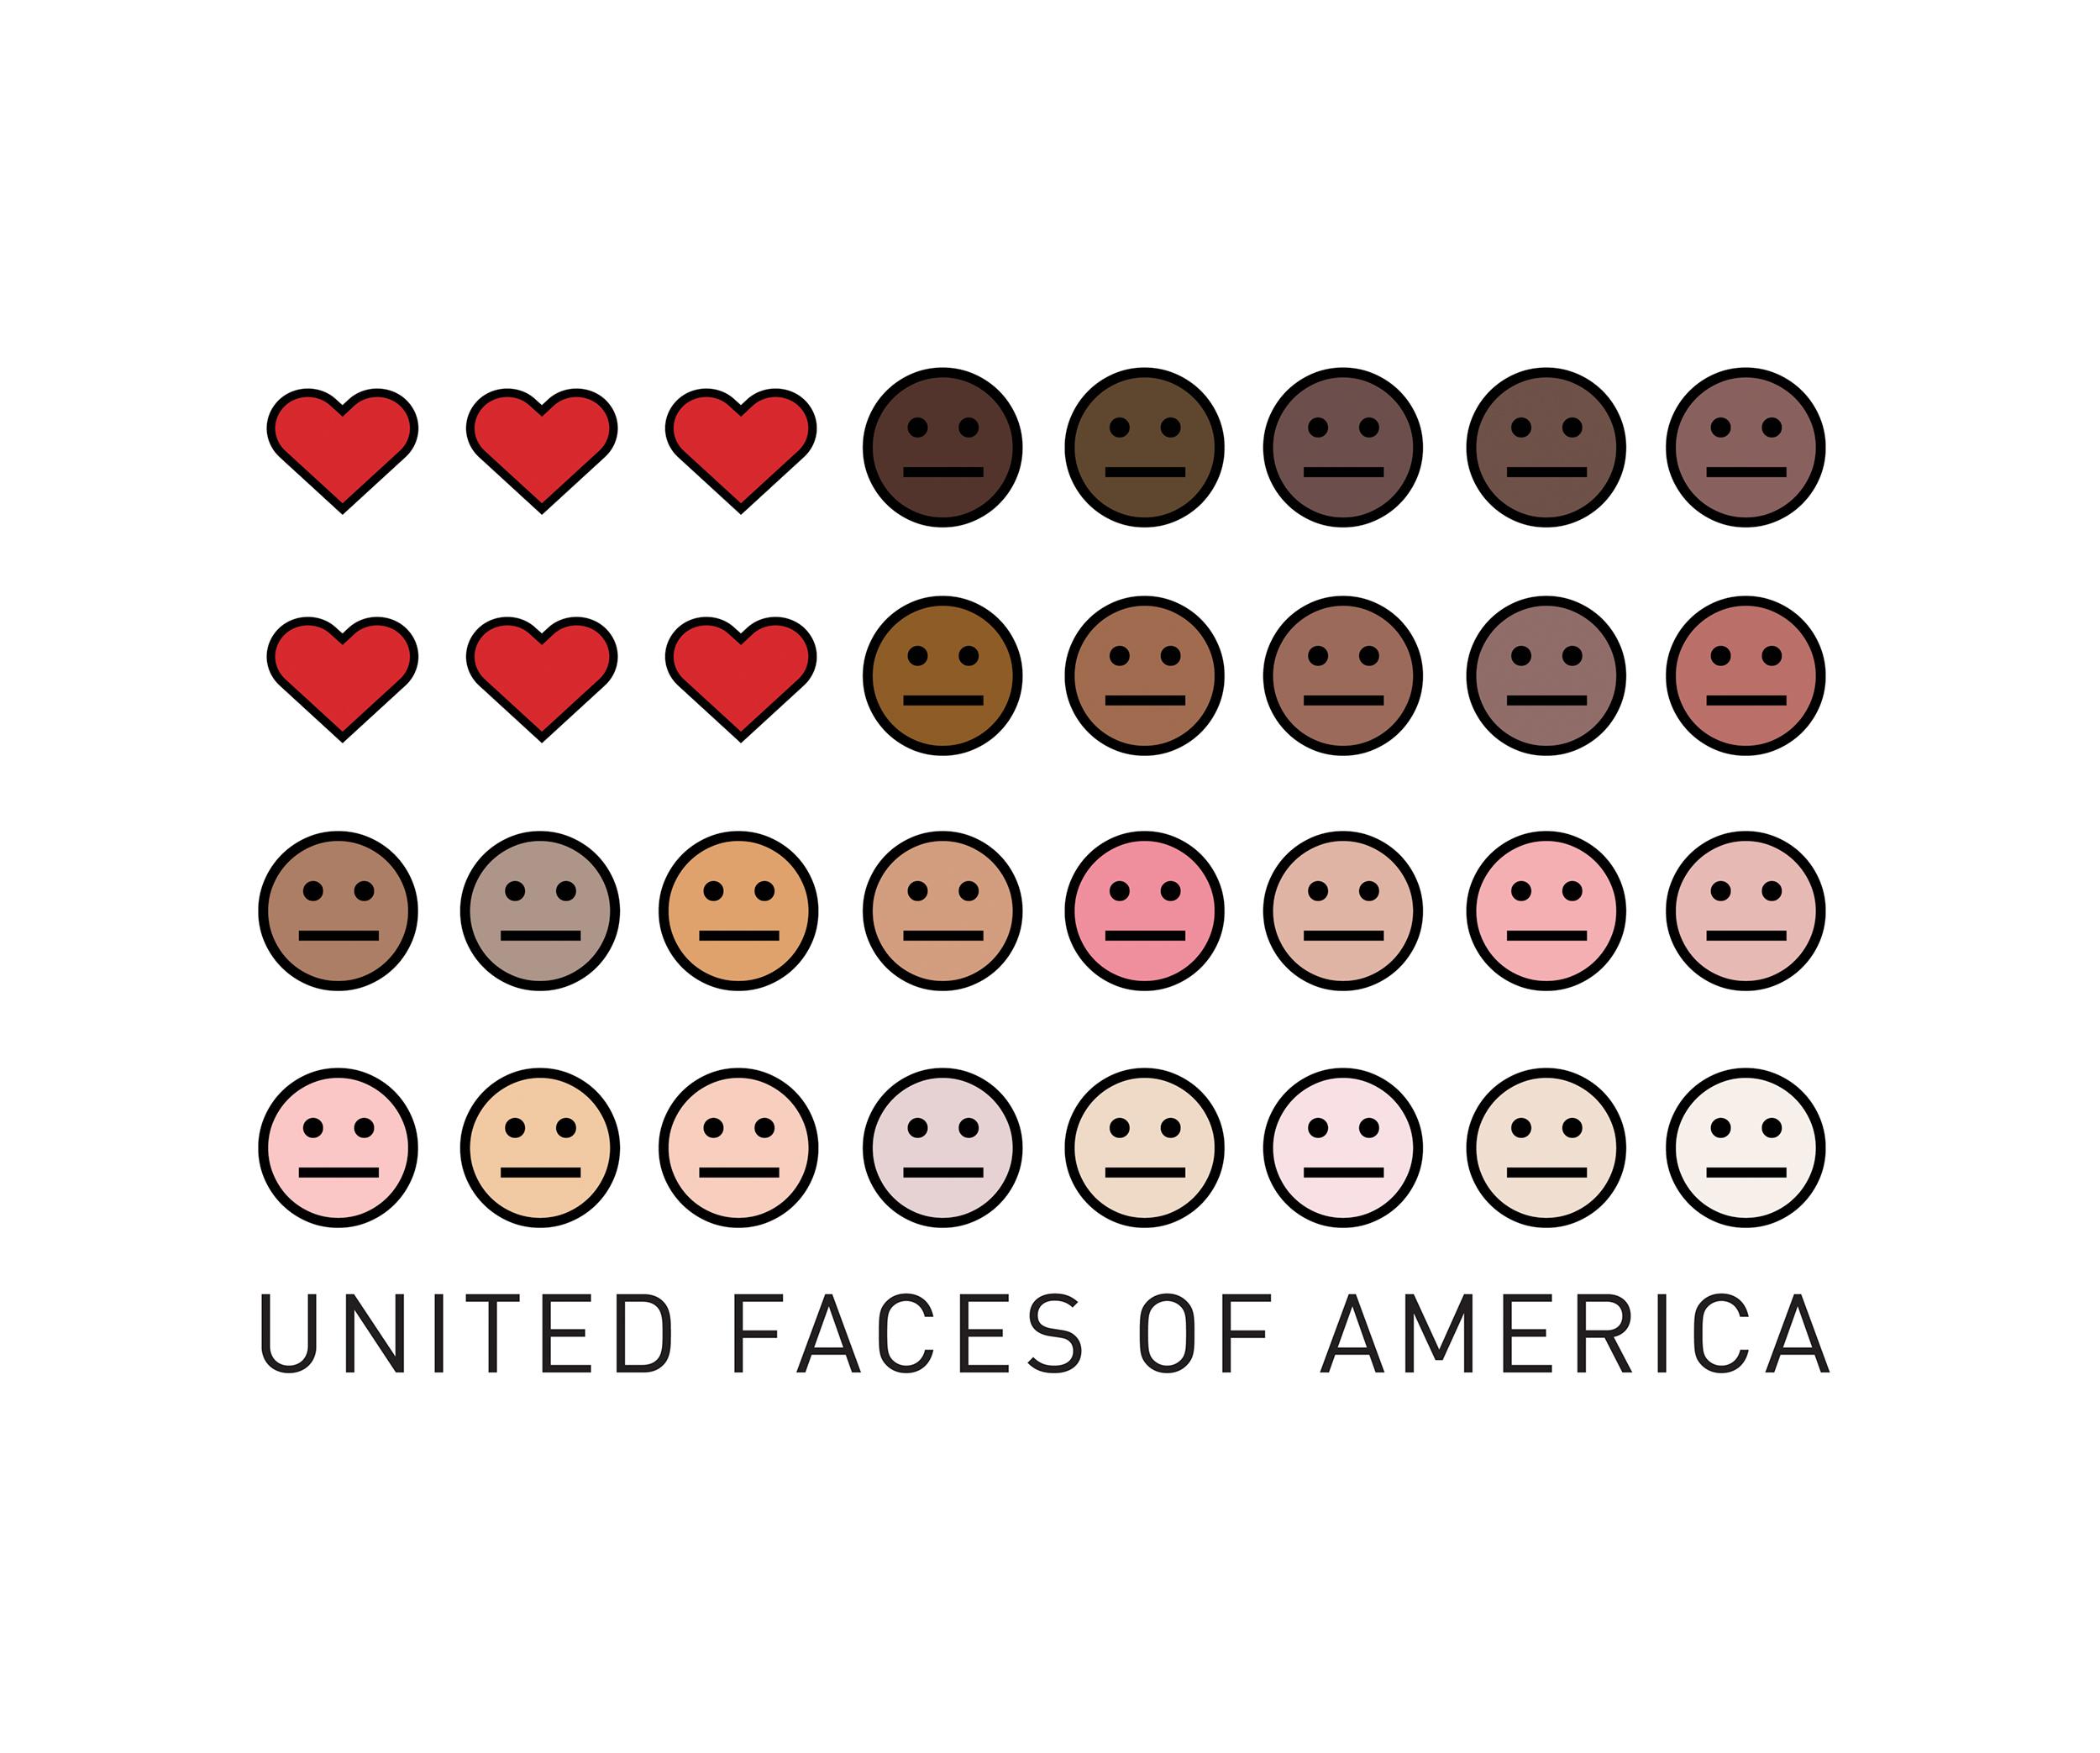 United Faces of America